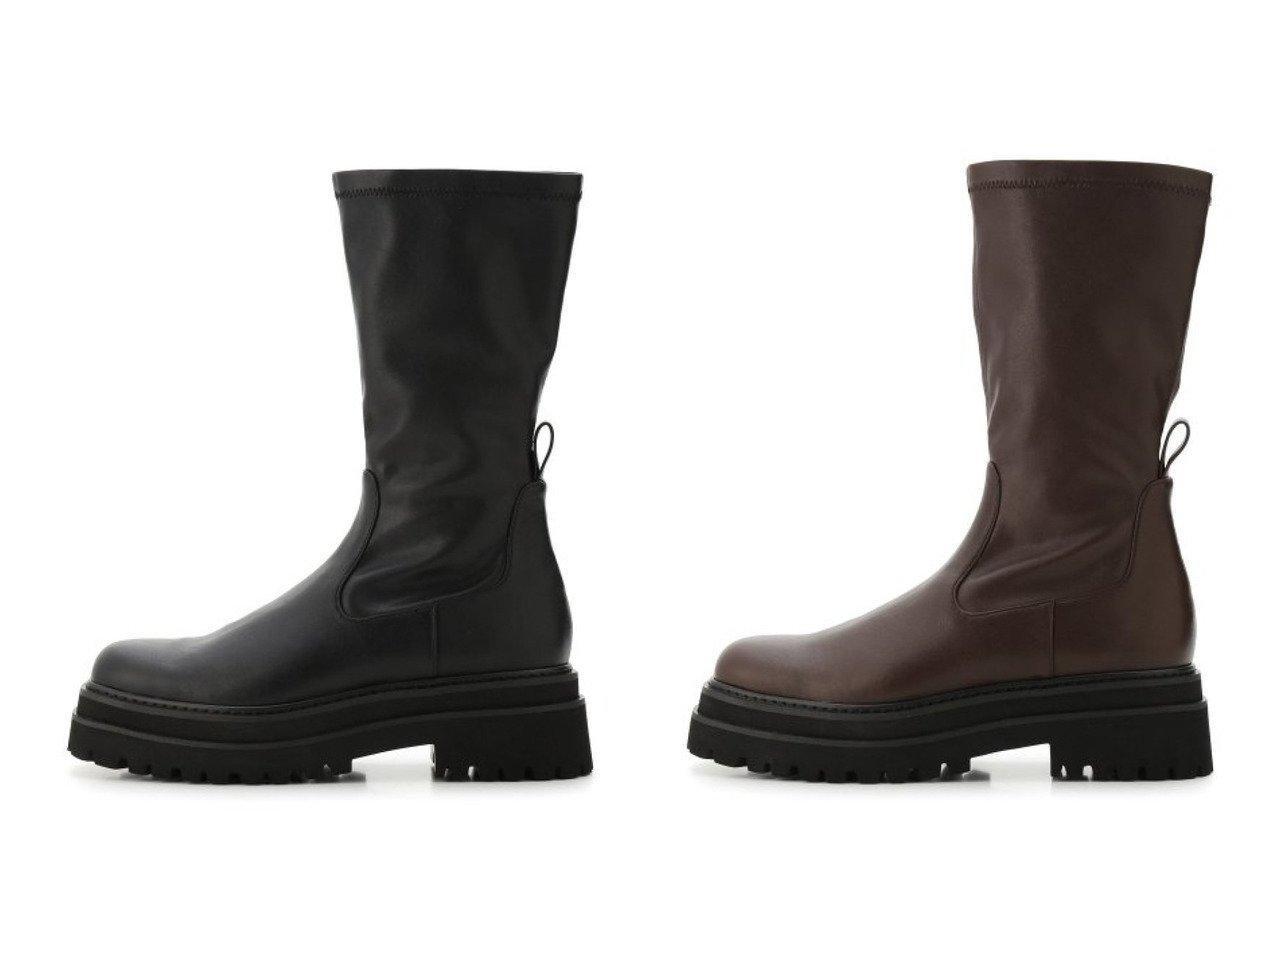 【Mila Owen/ミラオーウェン】のトラックソールストレッチブーツ シューズ・靴のおすすめ!人気、トレンド・レディースファッションの通販  おすすめで人気の流行・トレンド、ファッションの通販商品 メンズファッション・キッズファッション・インテリア・家具・レディースファッション・服の通販 founy(ファニー) https://founy.com/ ファッション Fashion レディースファッション WOMEN NEW・新作・新着・新入荷 New Arrivals 10月号 12月号 シューズ ショート ストレッチ バランス フィット フェイクレザー  ID:crp329100000009835